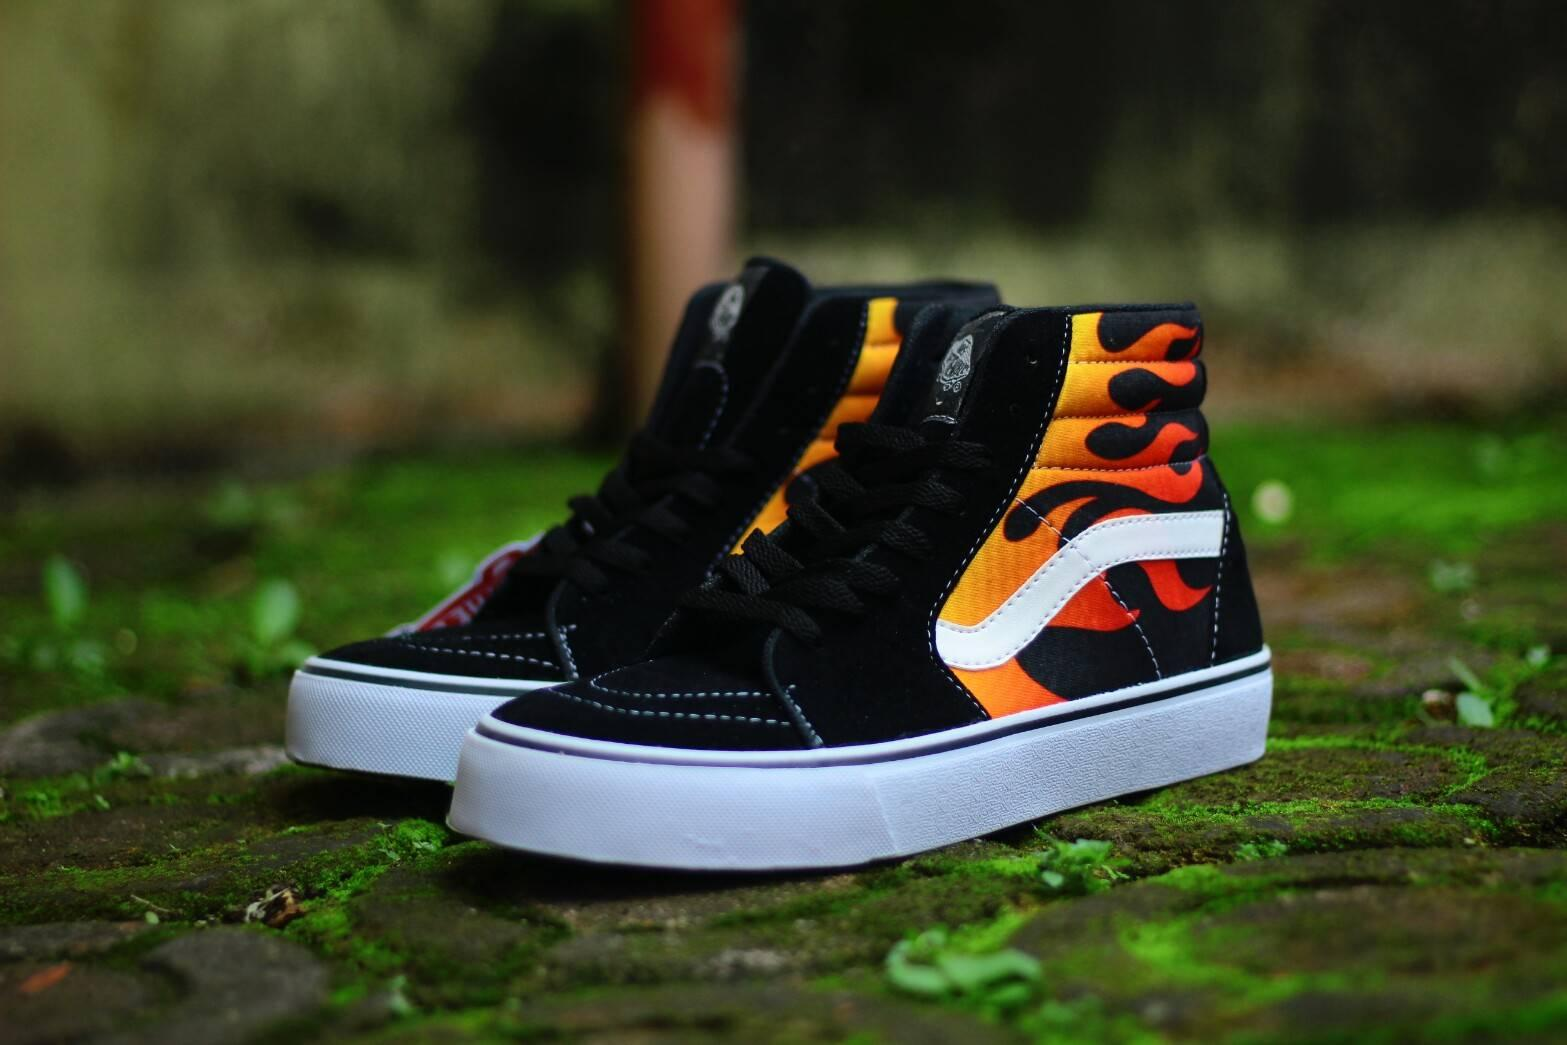 Sepatu Skate Casual Pria Vans SK8 High Cartoon Sneakers 1ca8711350